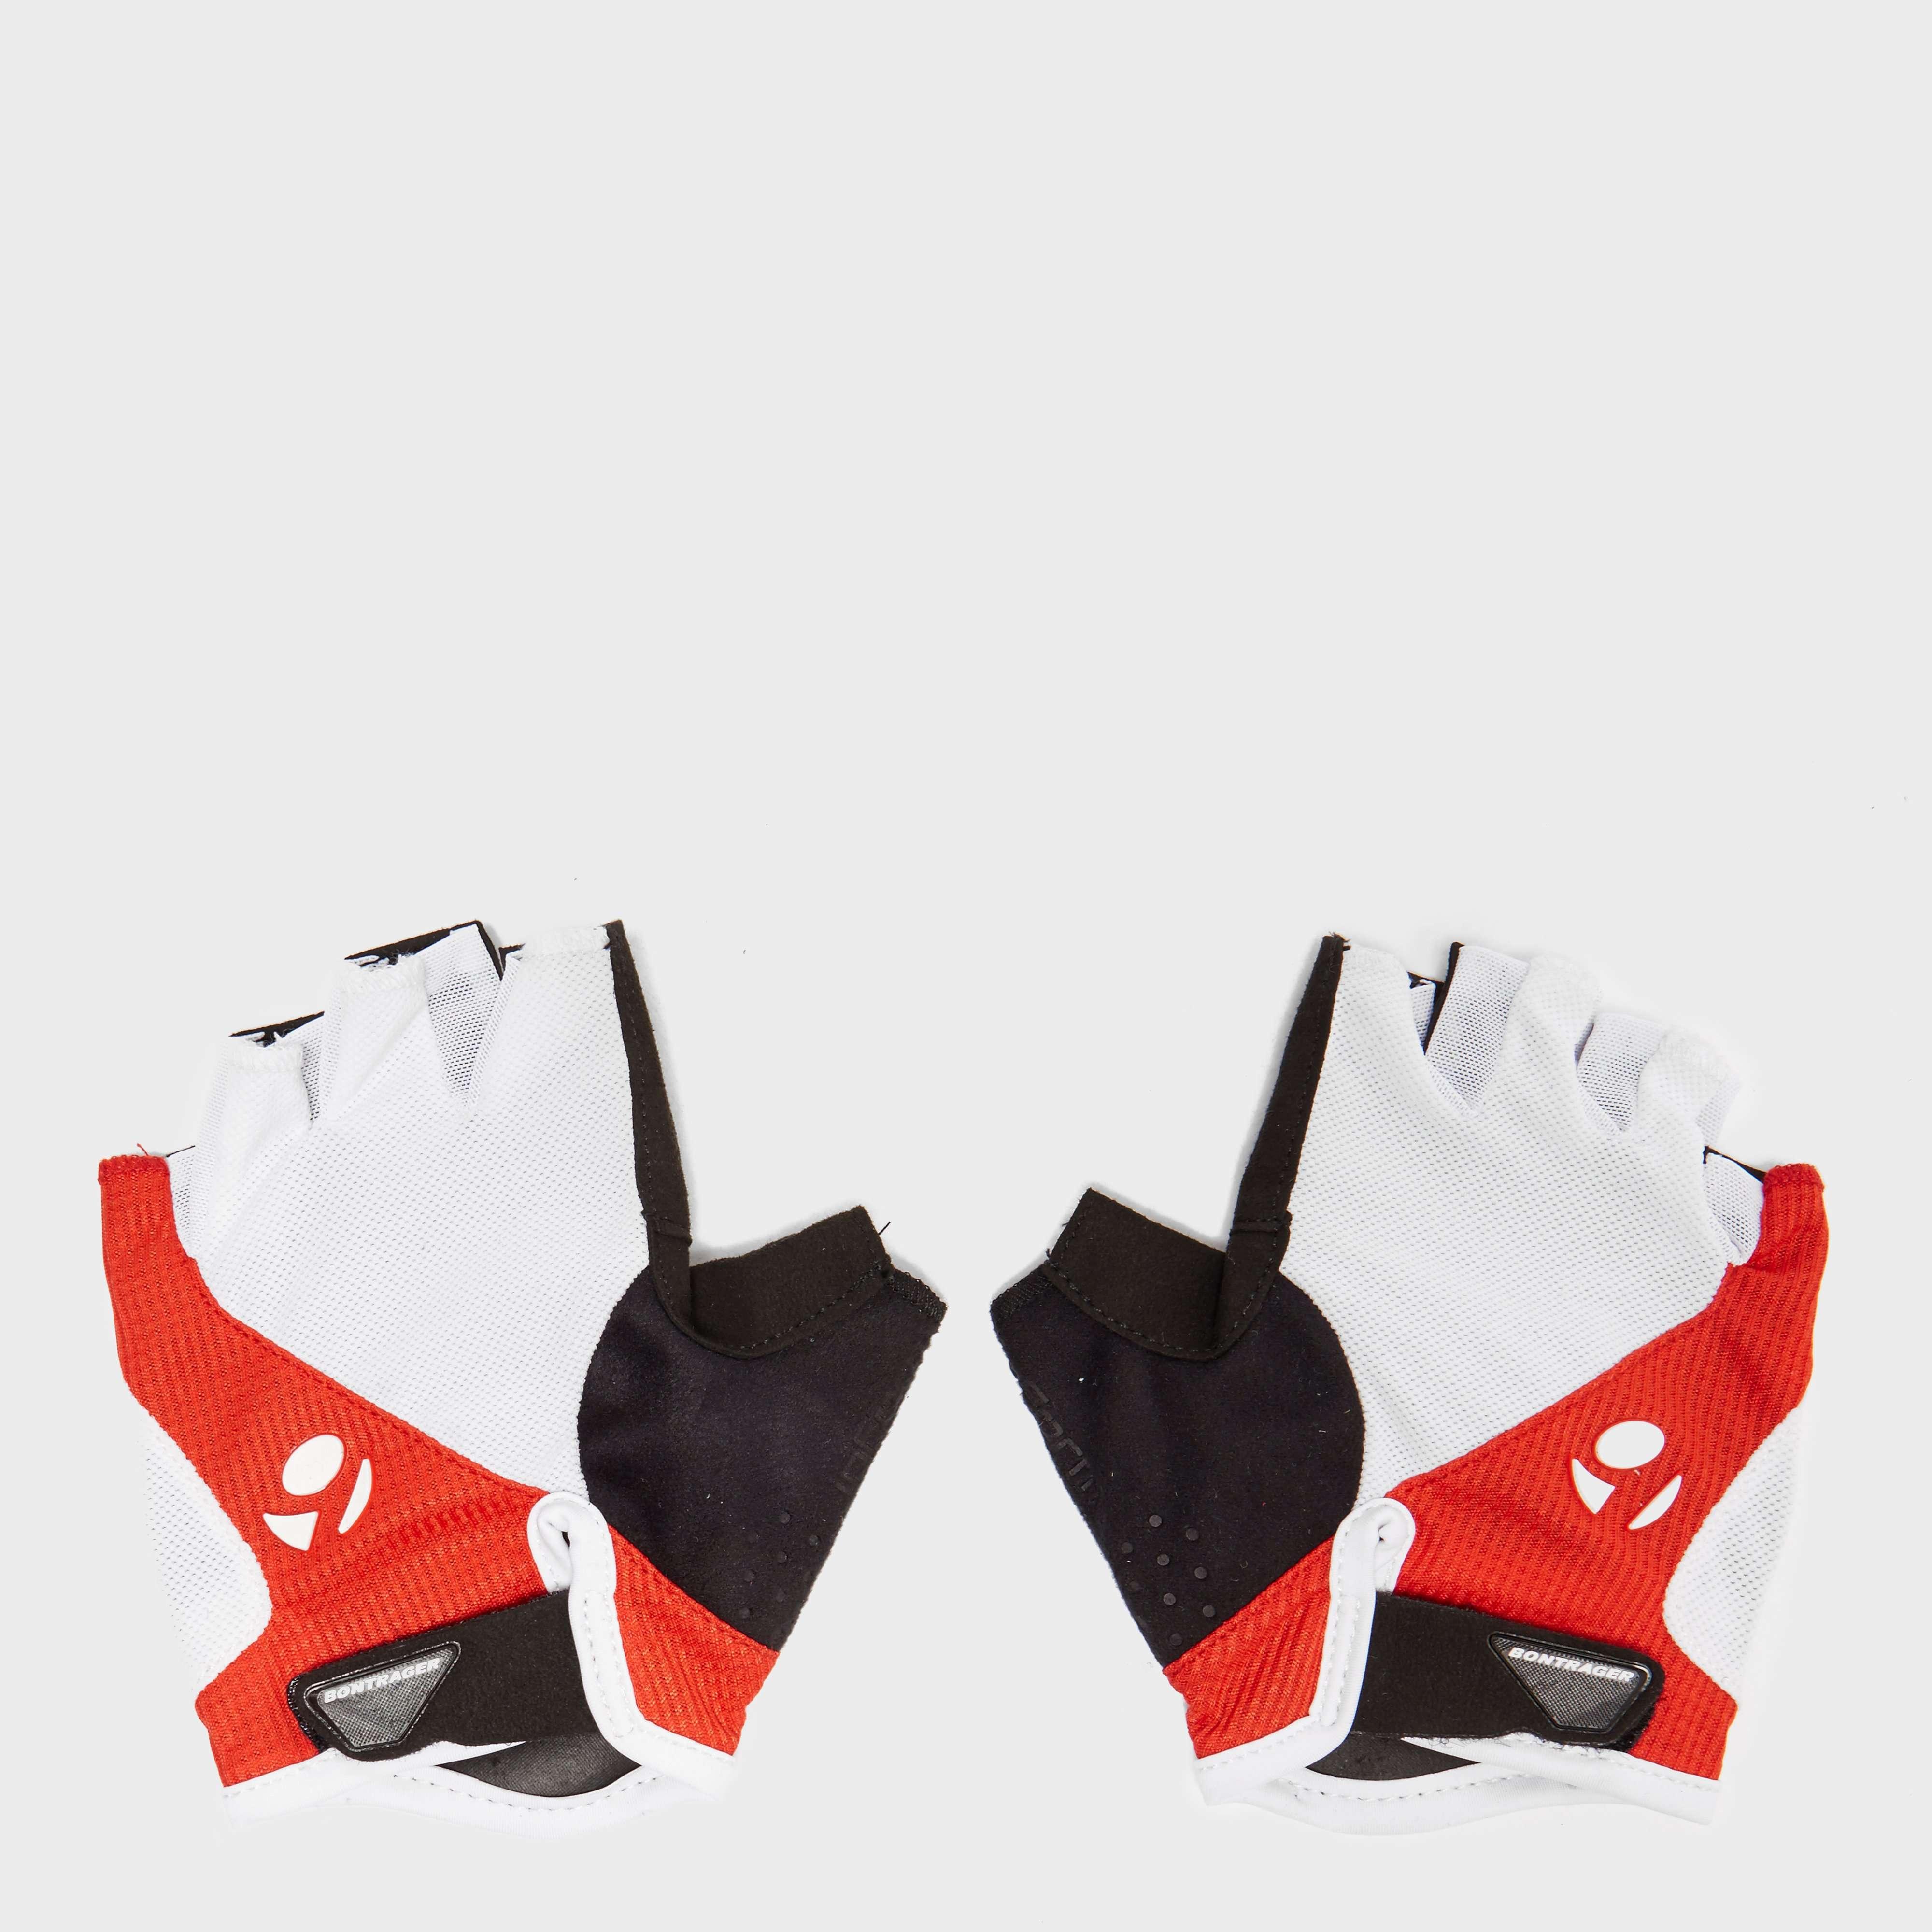 BONTRAGER Race Gel Cycling Gloves